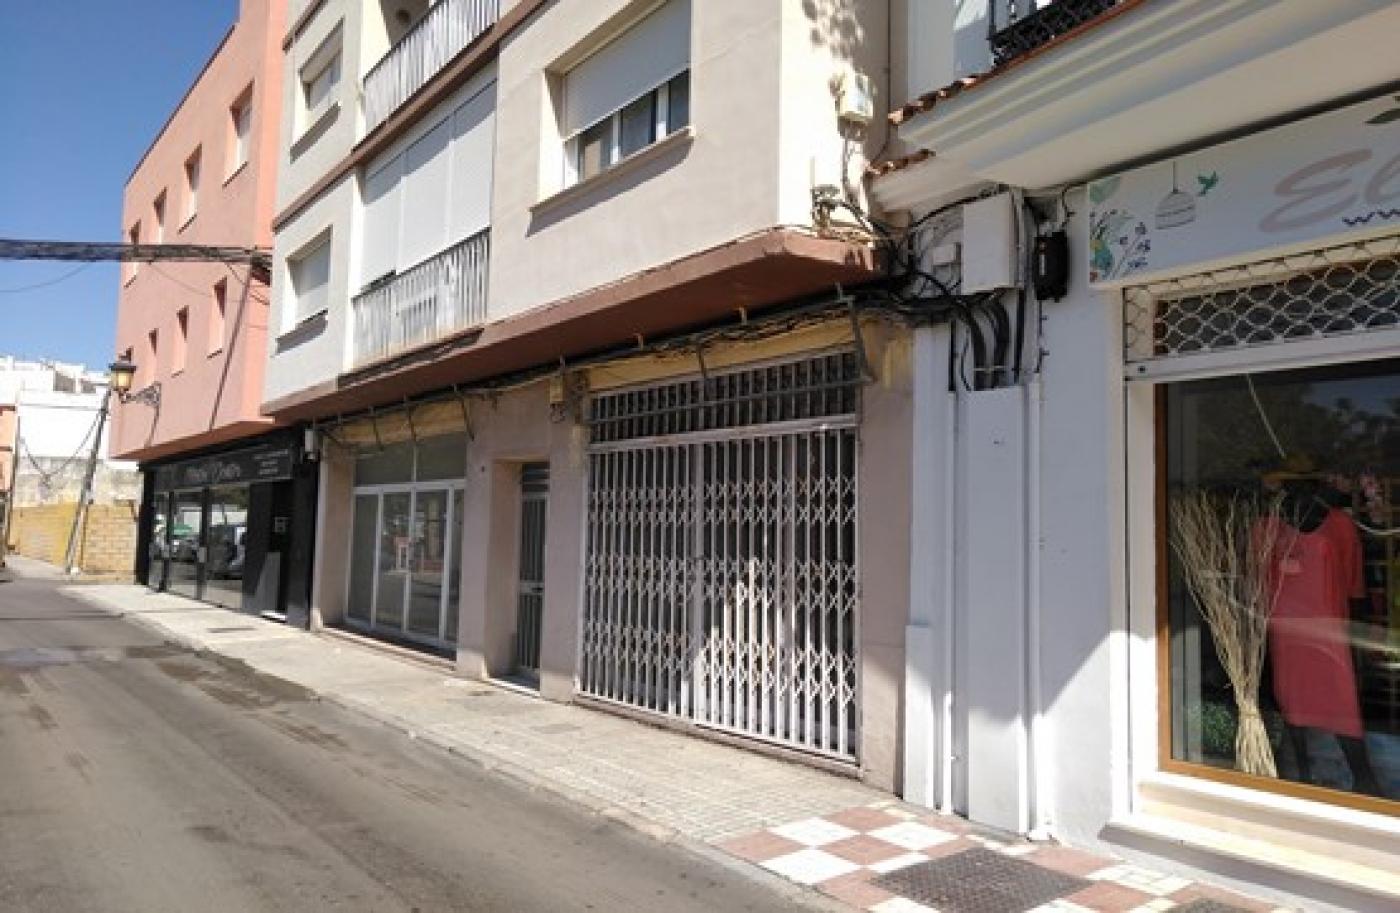 Bank properties in Cádiz